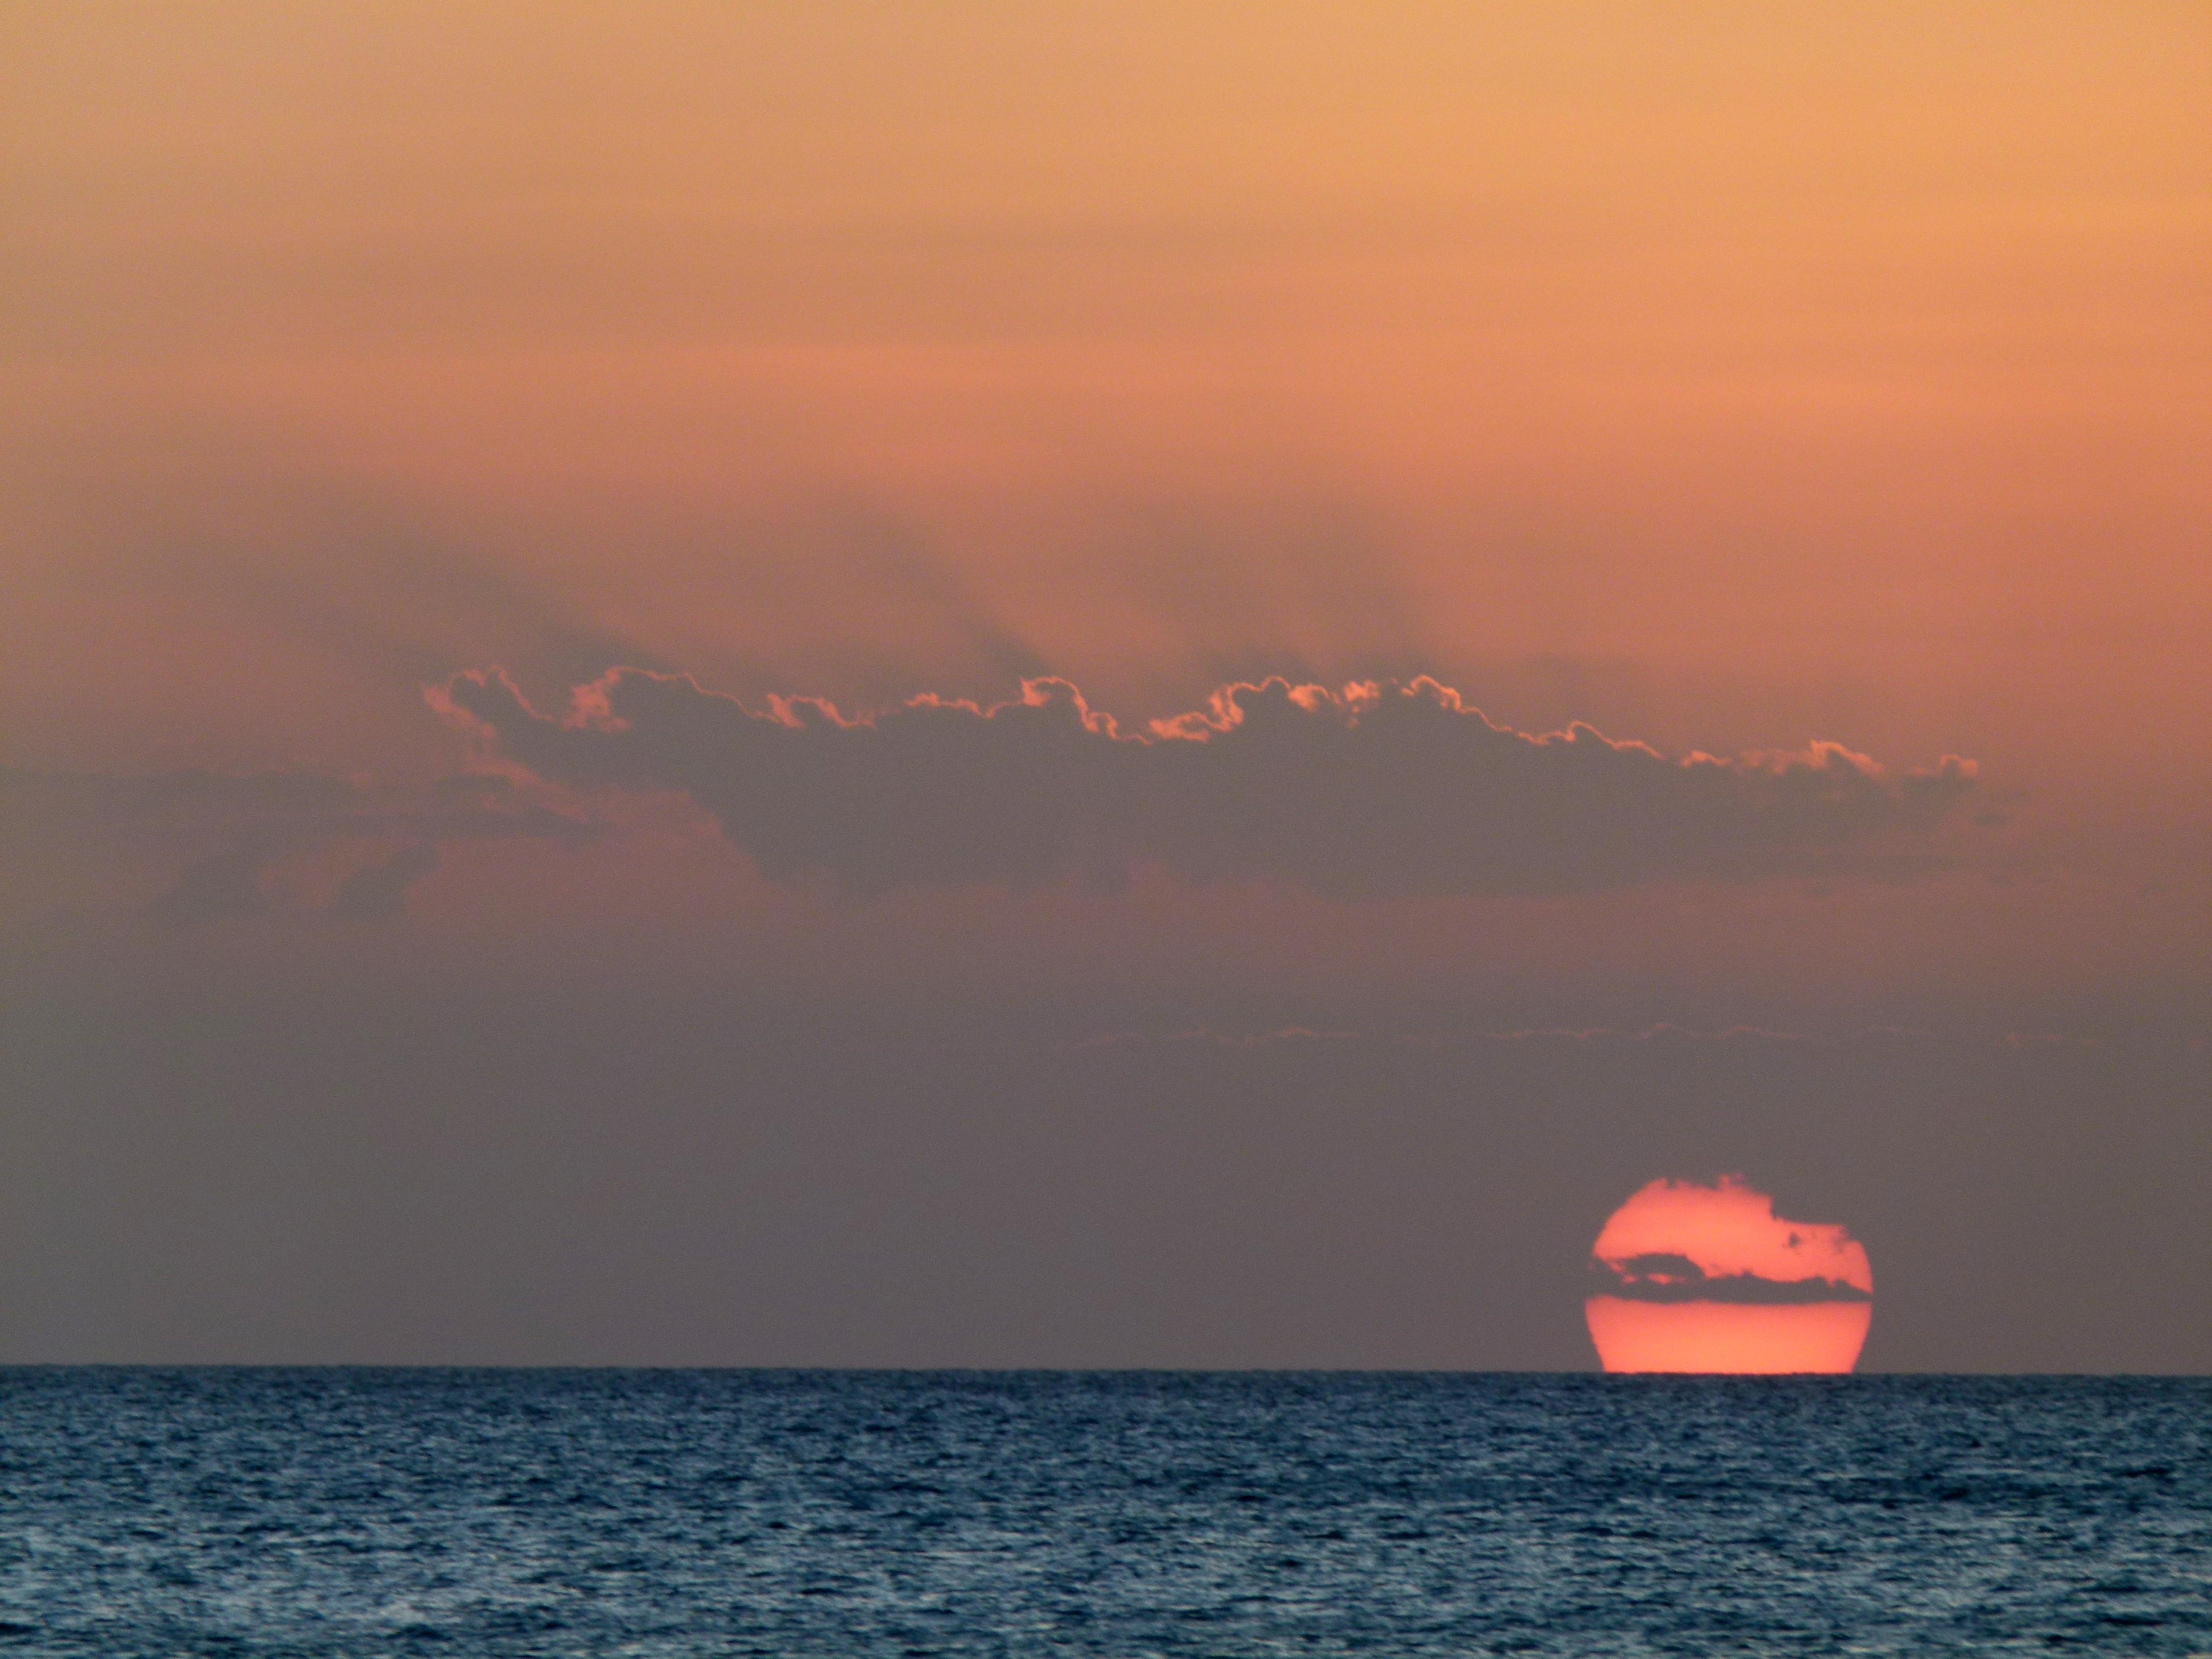 Zanzíbar / Oceà Índic